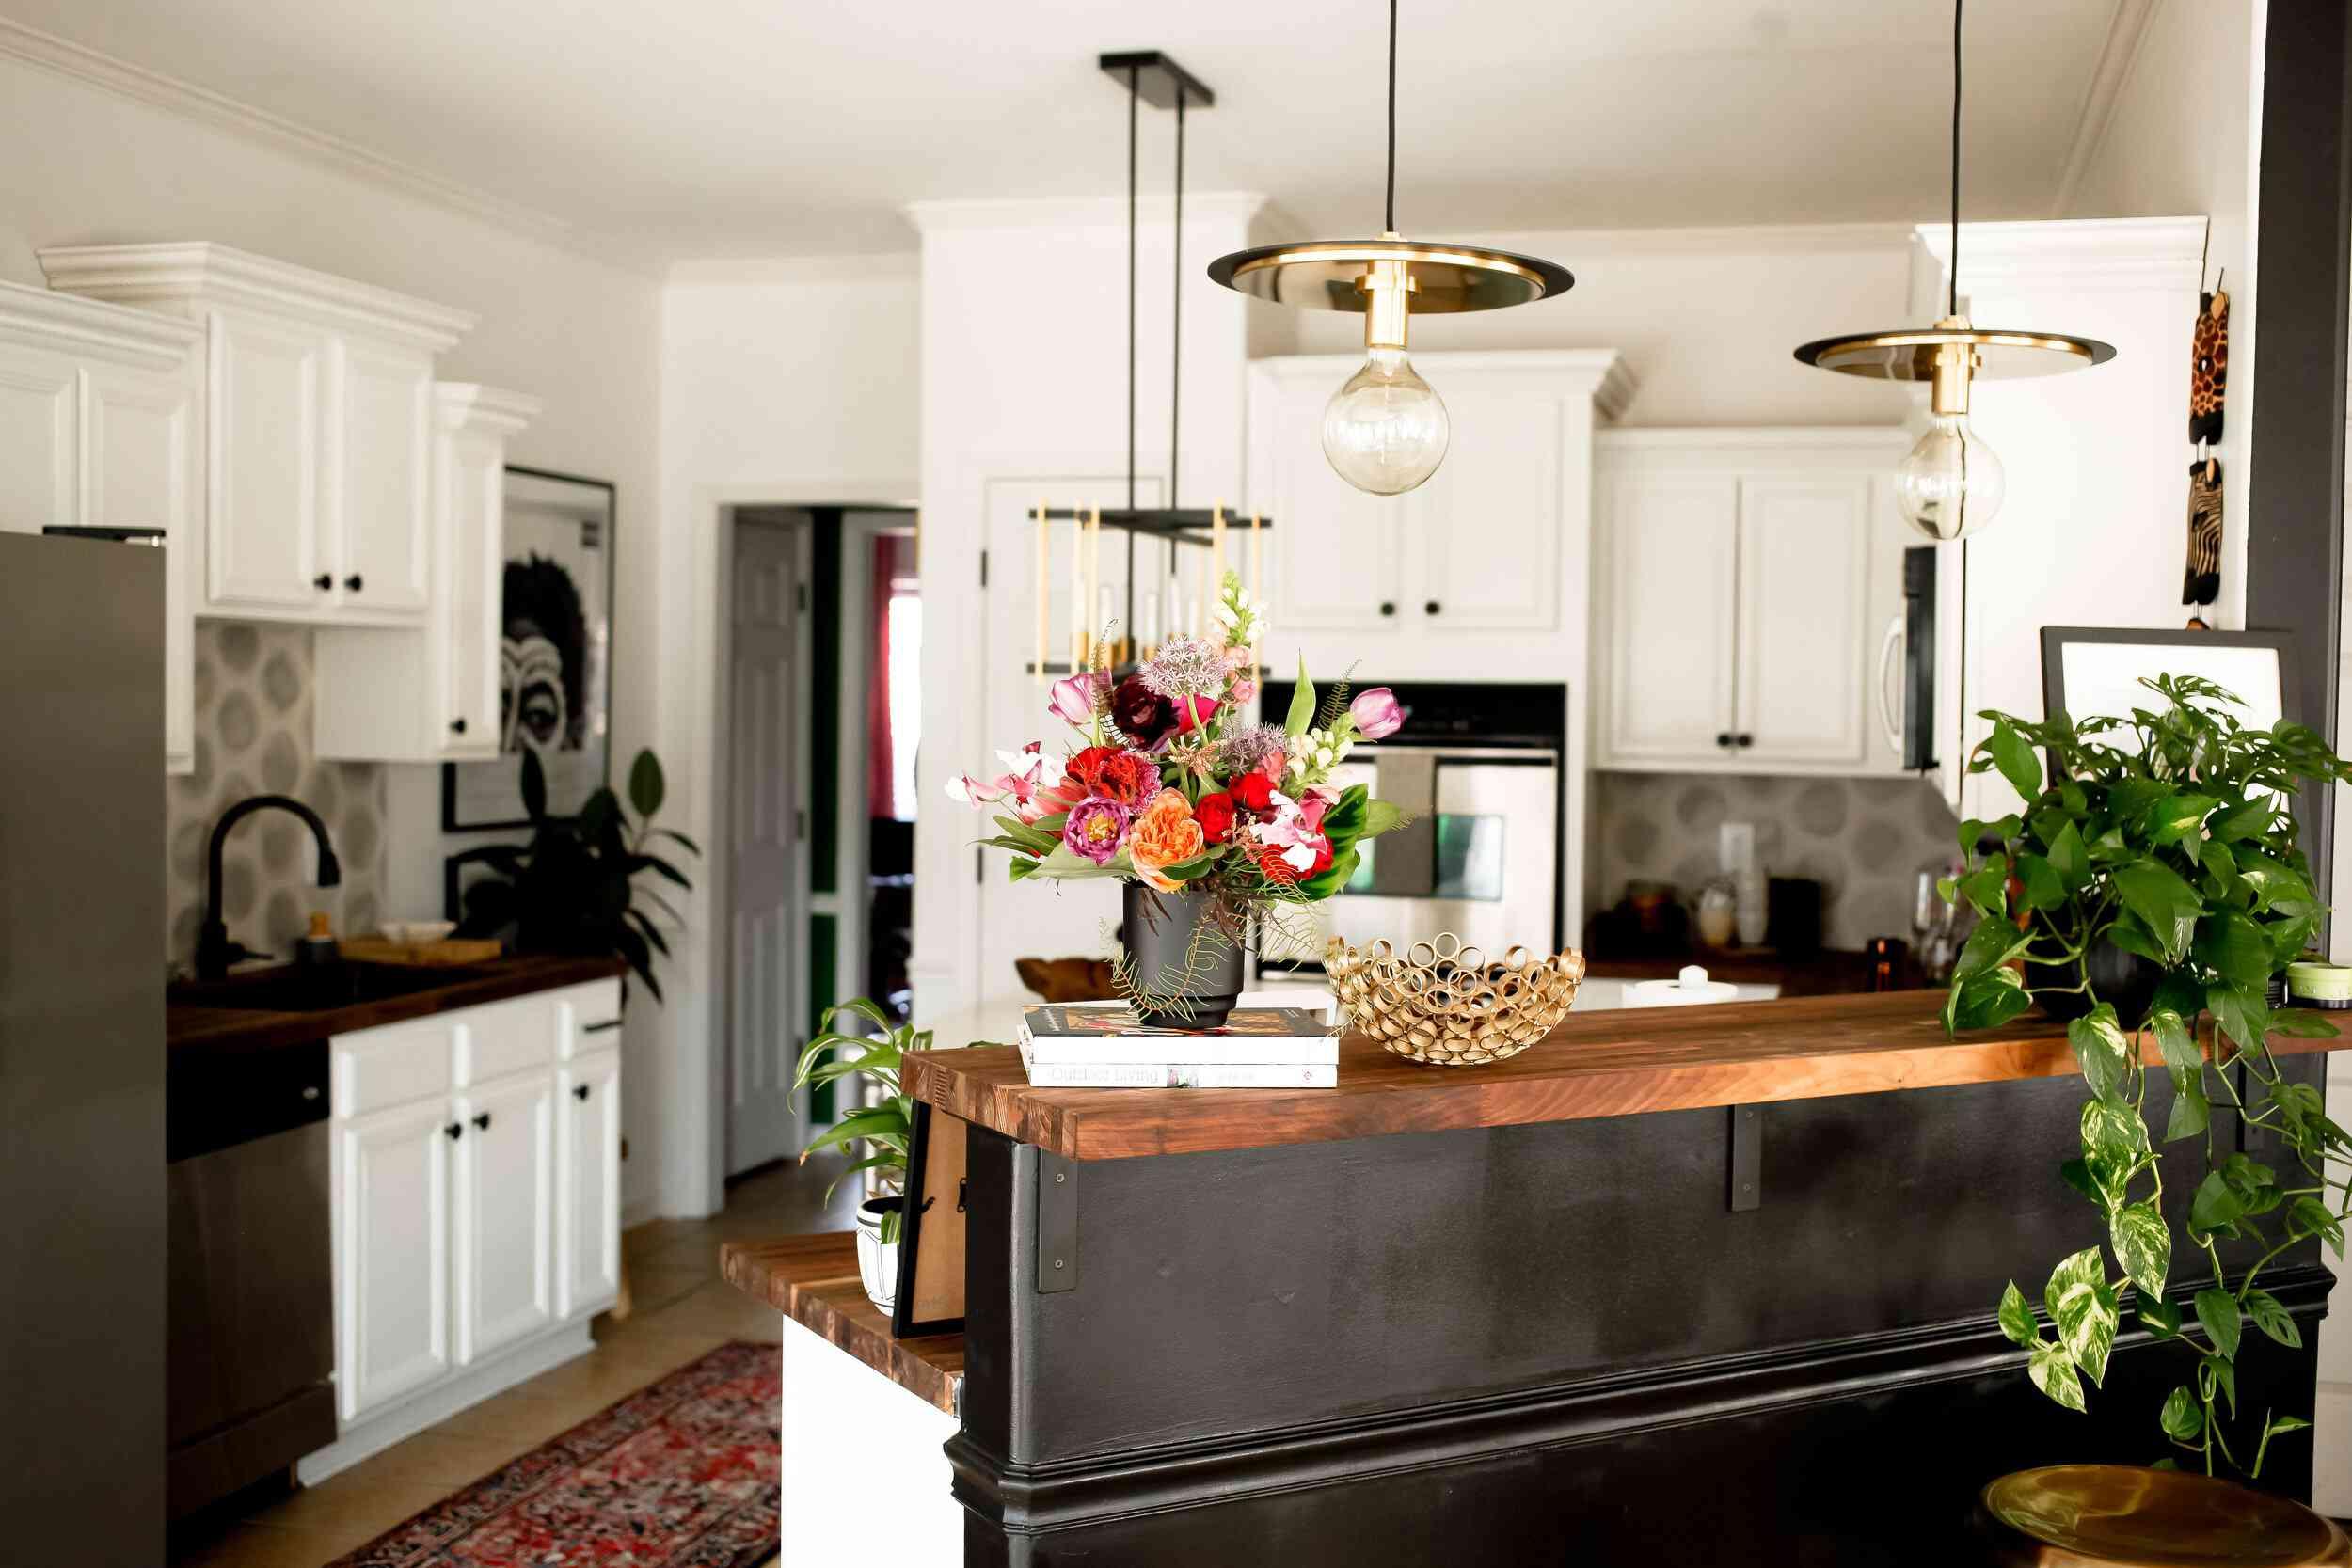 Modern kitchen with vintage style minimal pendant lights